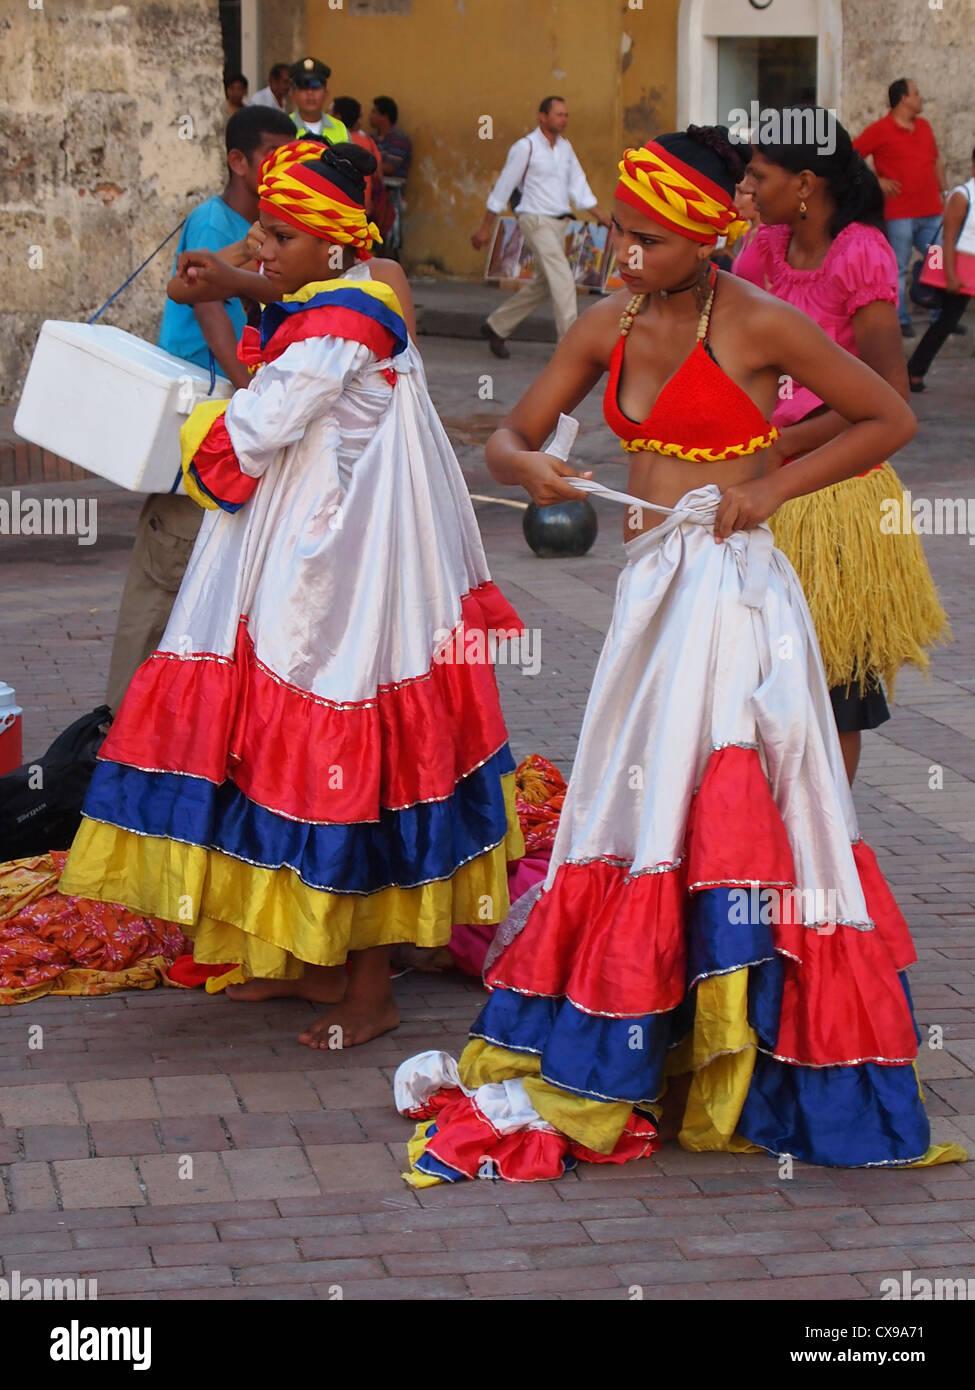 Traditional Cumbia Dancers preparing in Cartagena, North Colombia - Stock Image